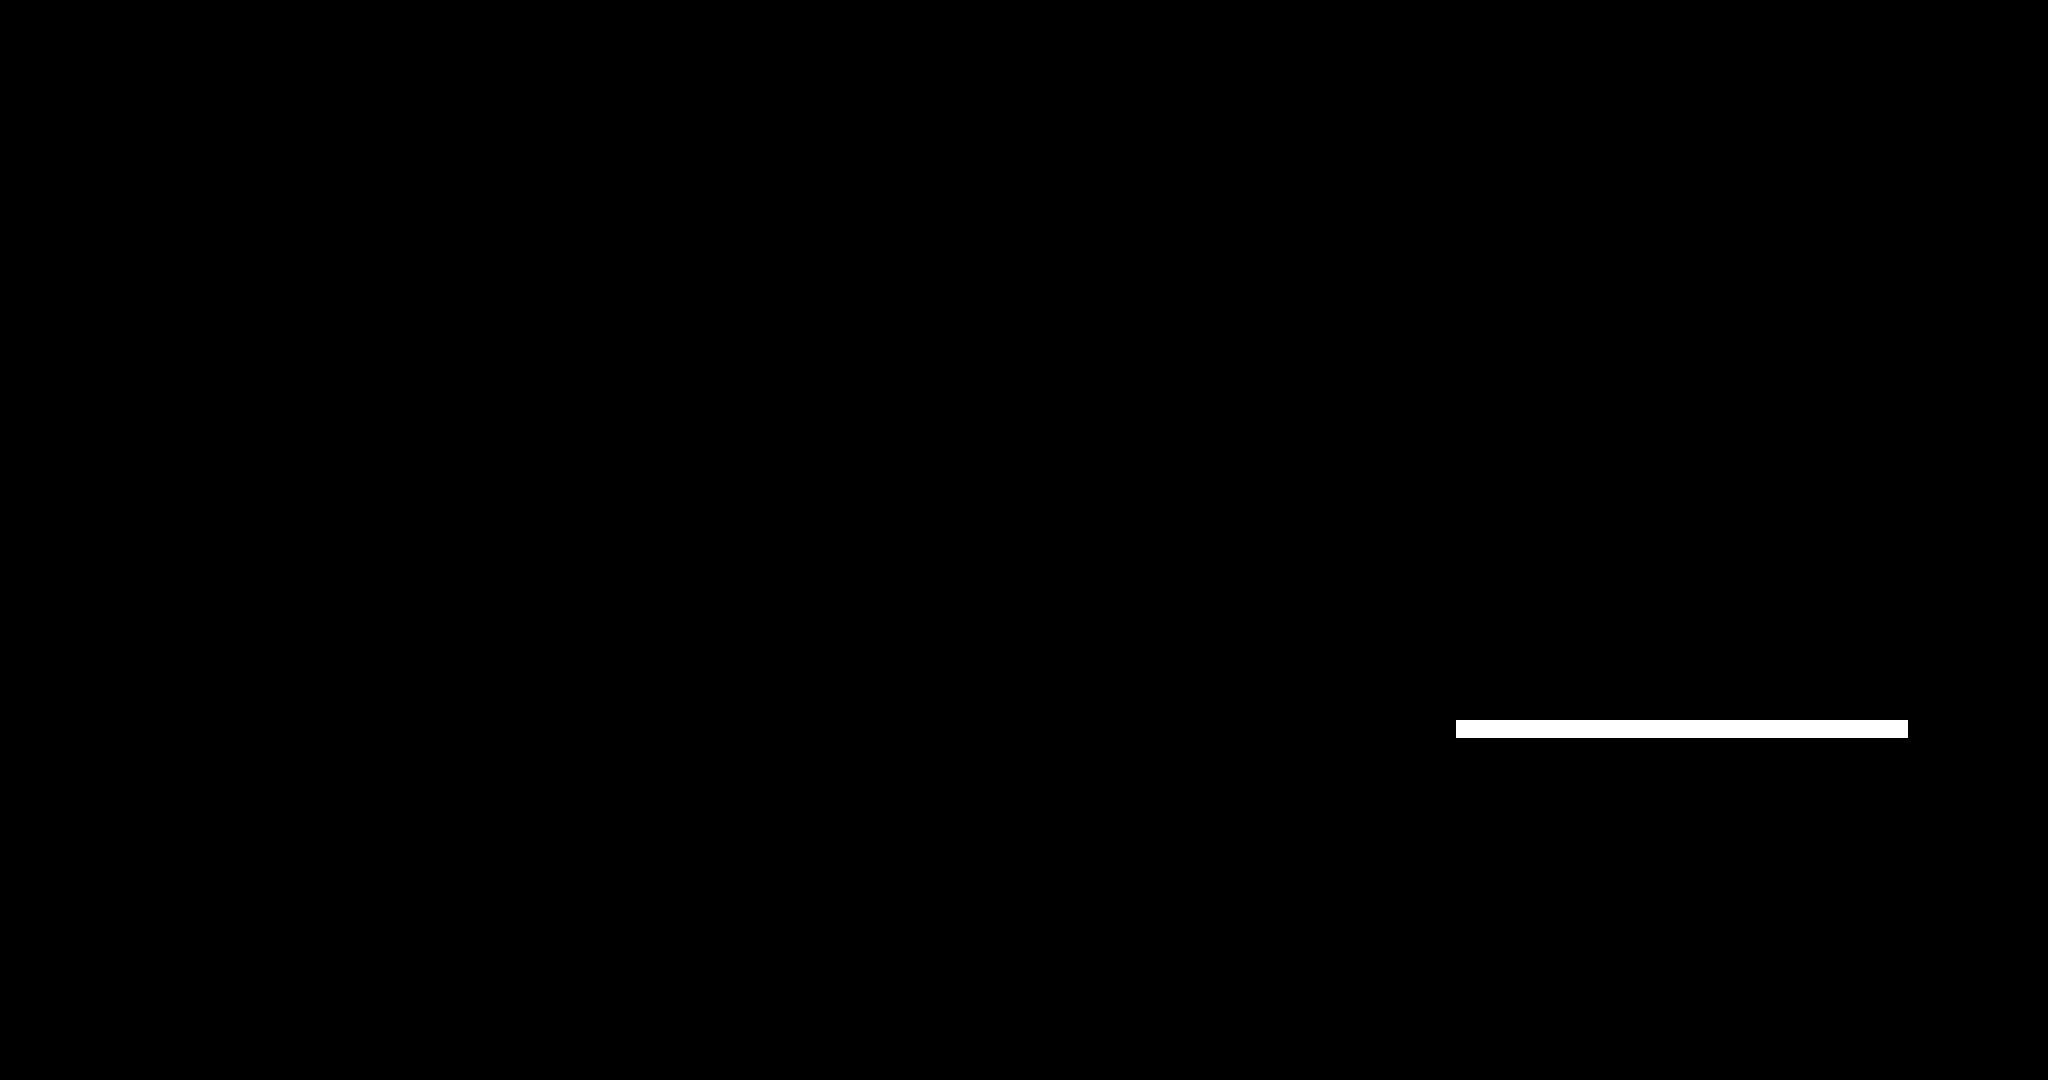 FTT ProducerProfile Logo Black.png